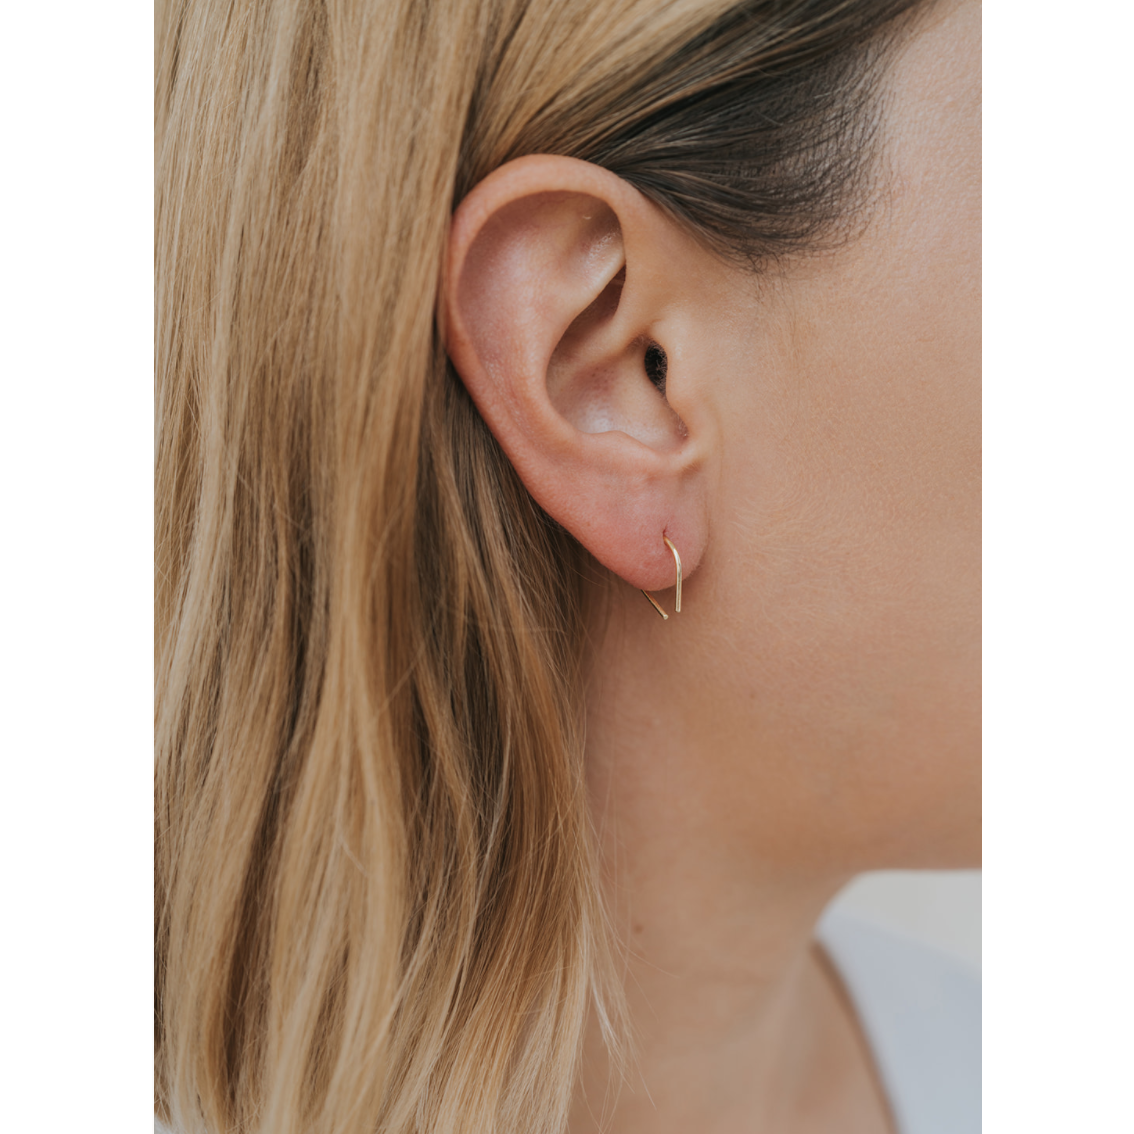 Minimalist Horseshoe Earring